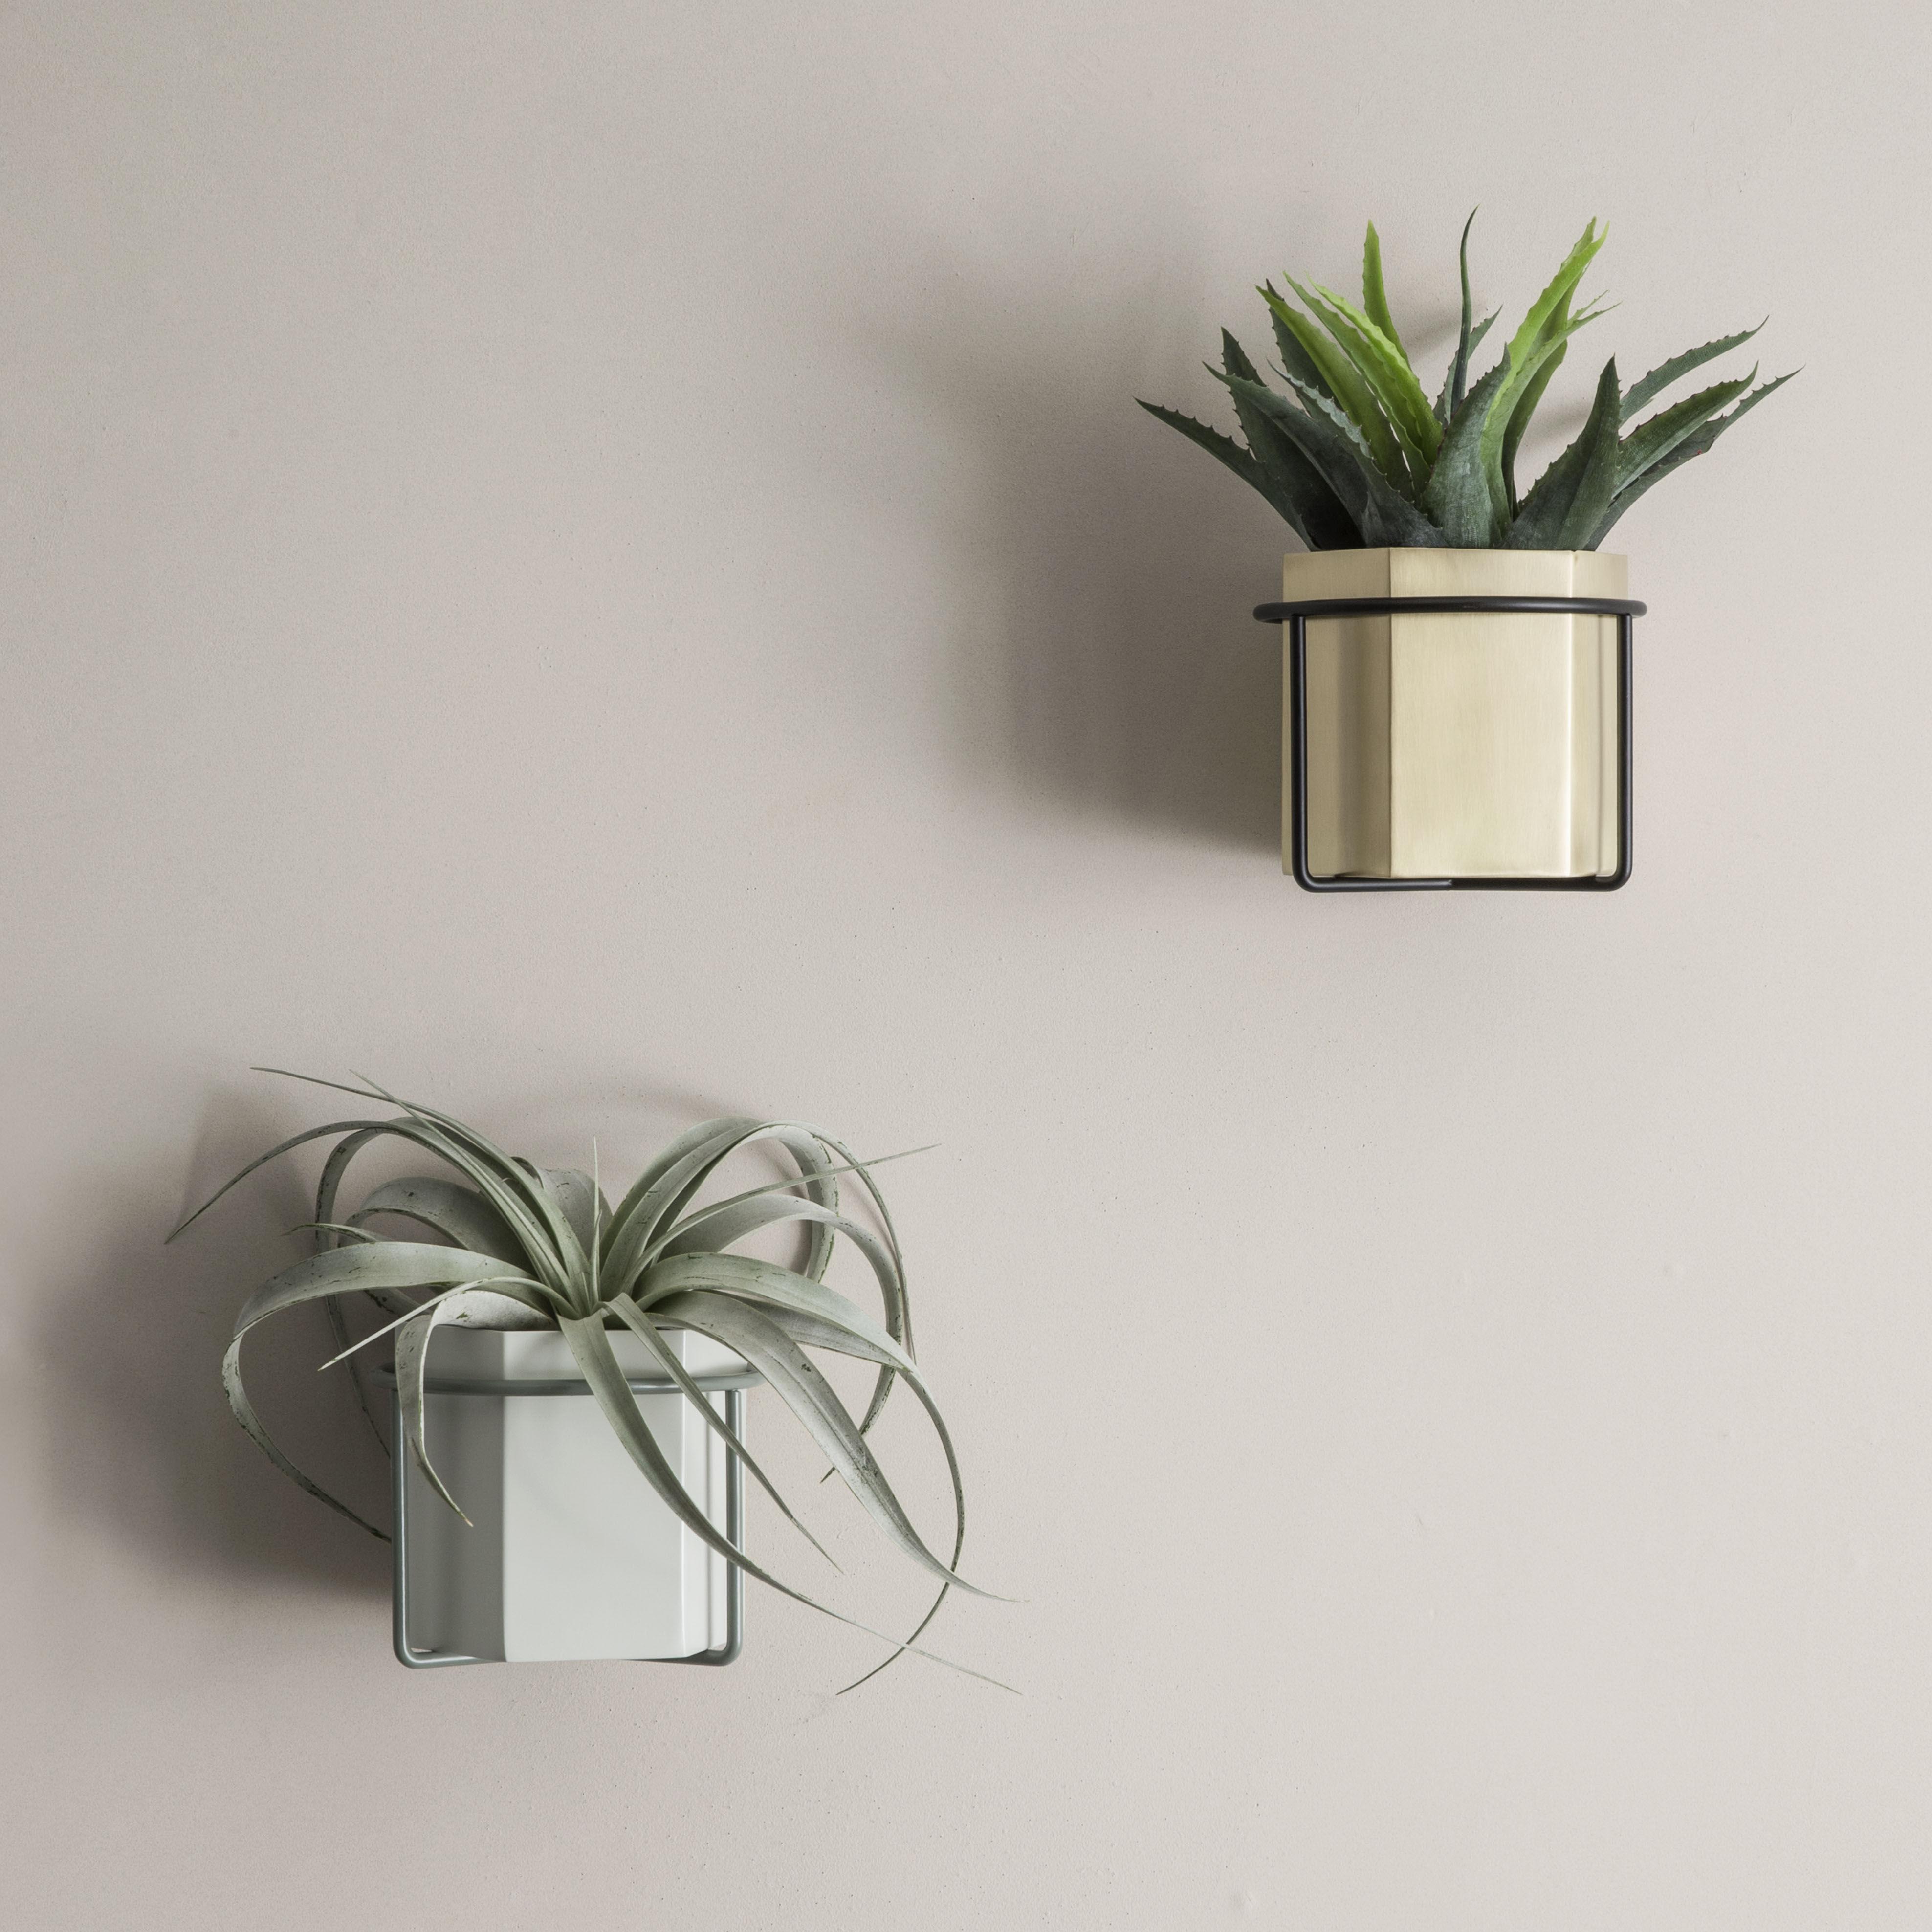 plant f r blument pfe ferm living wandhalterung. Black Bedroom Furniture Sets. Home Design Ideas